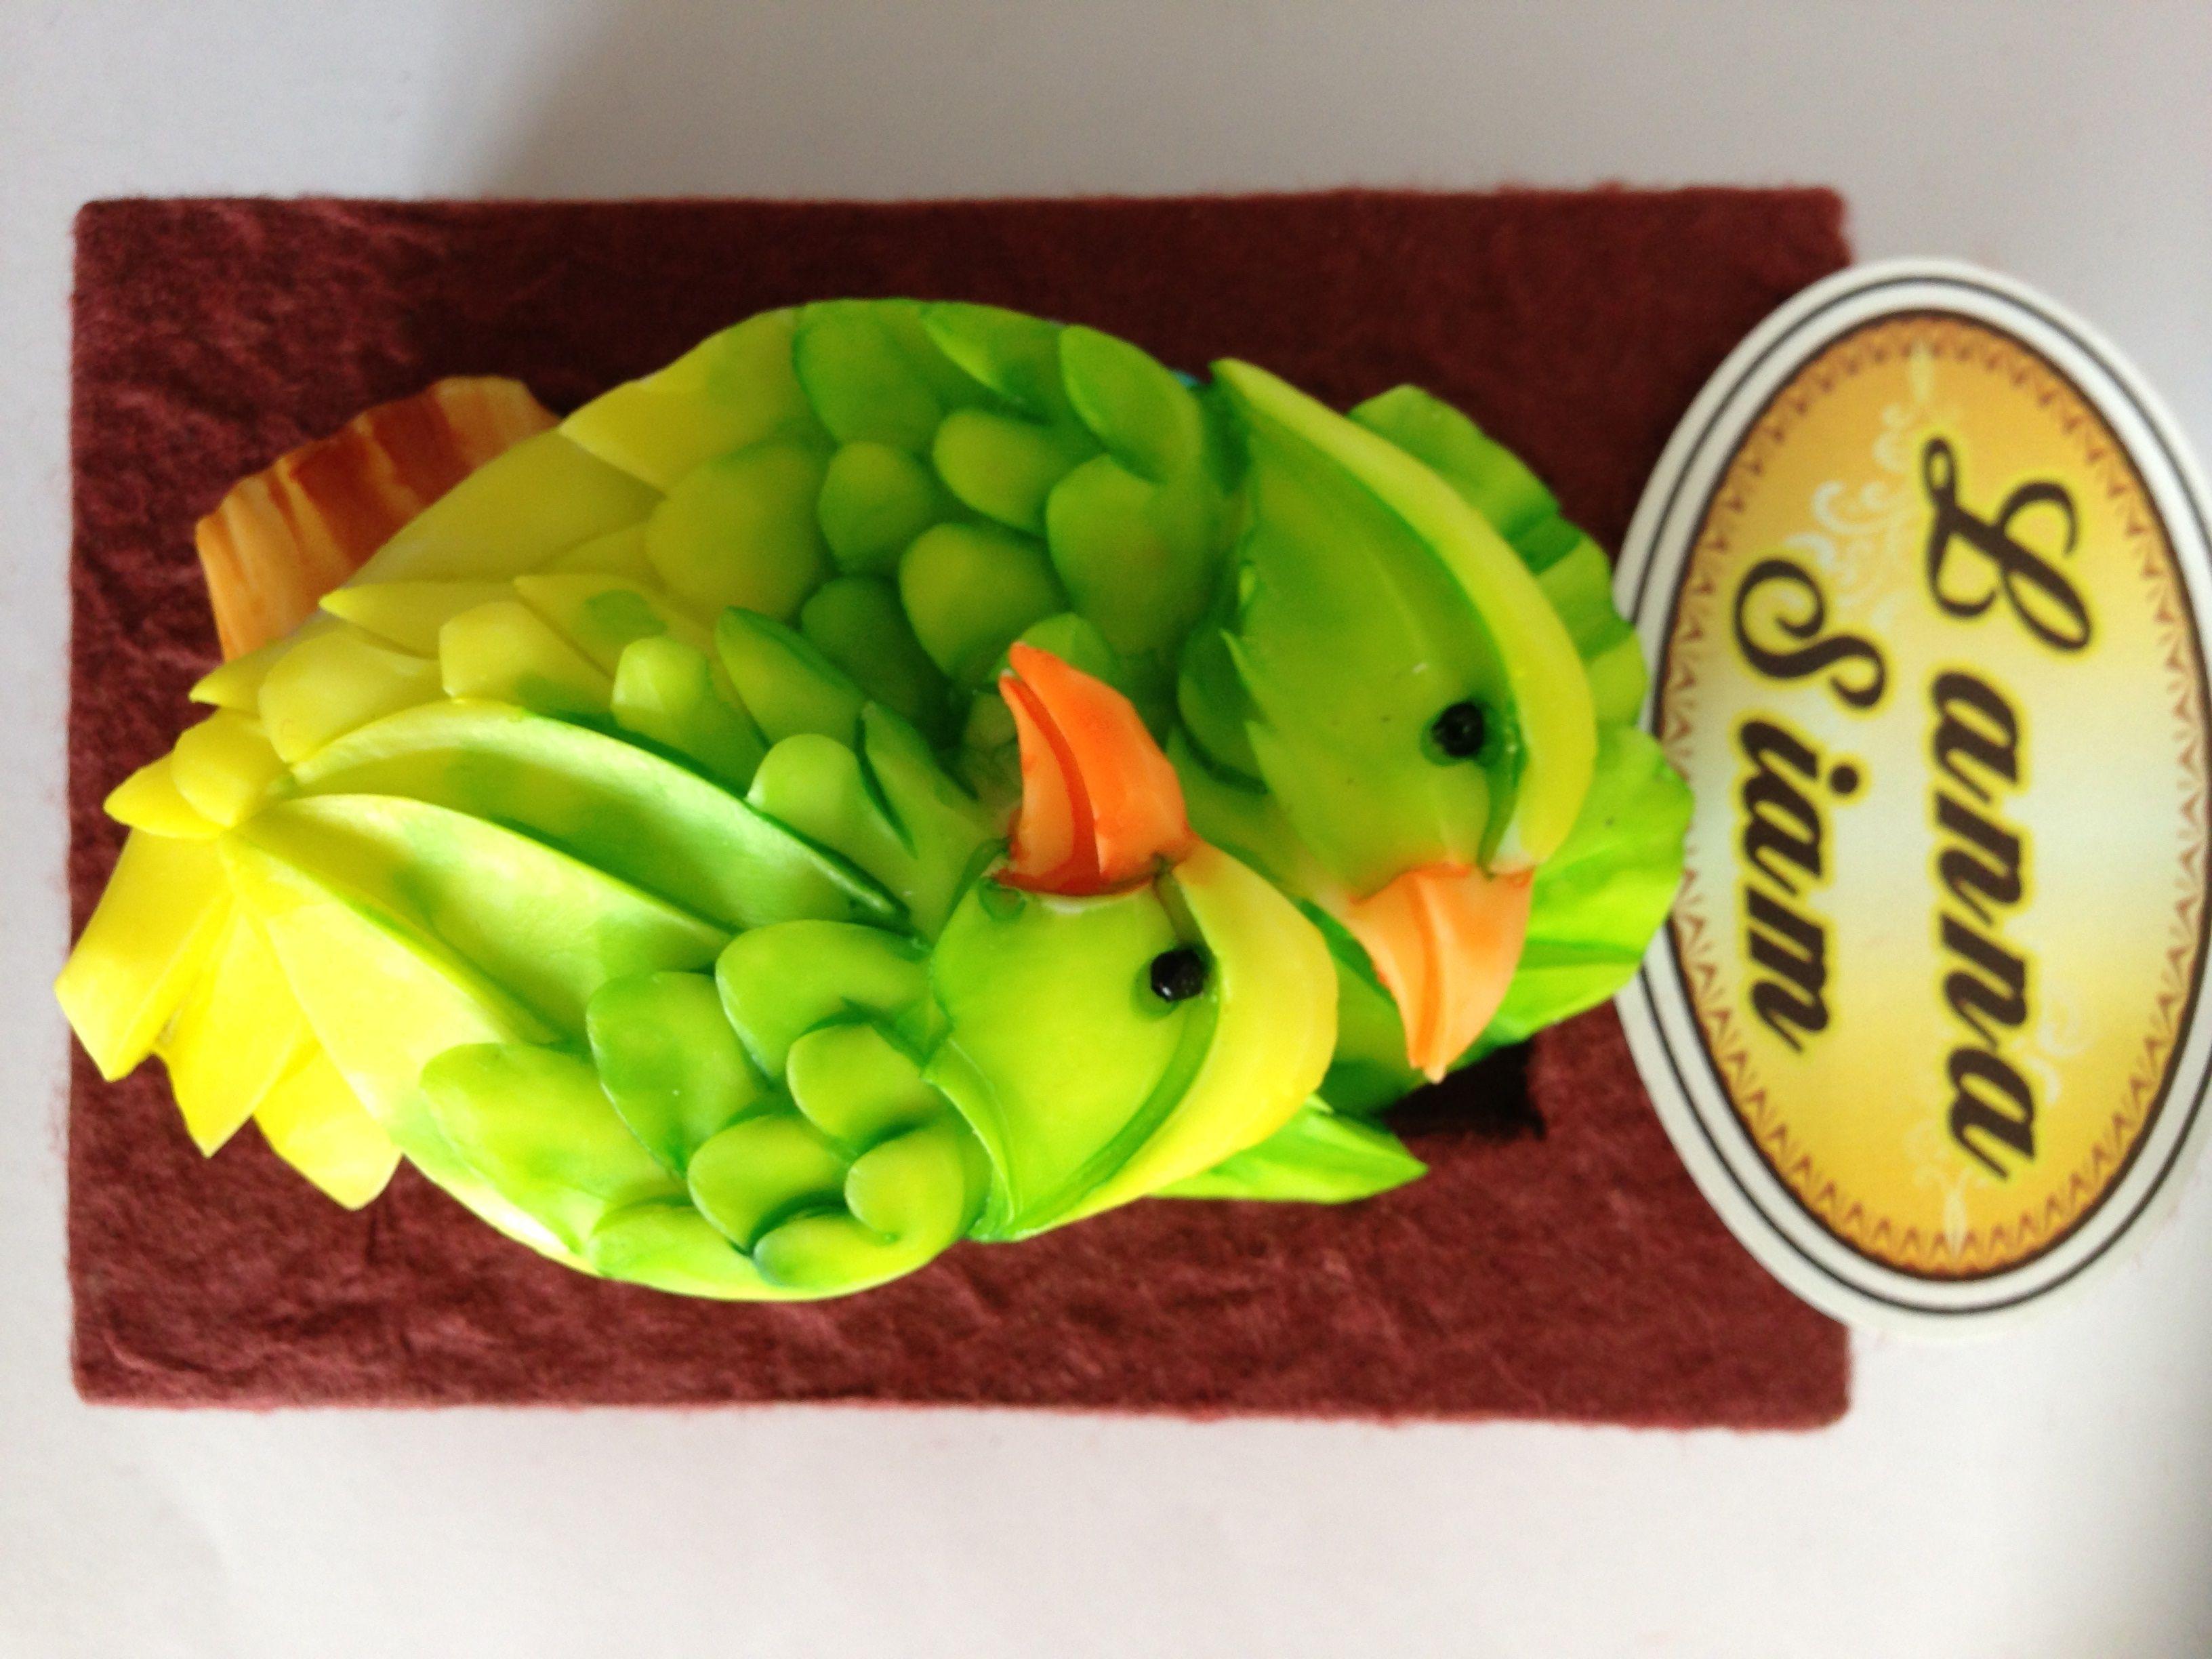 Lanna siam soap carving lanna siam crafts pinterest soap